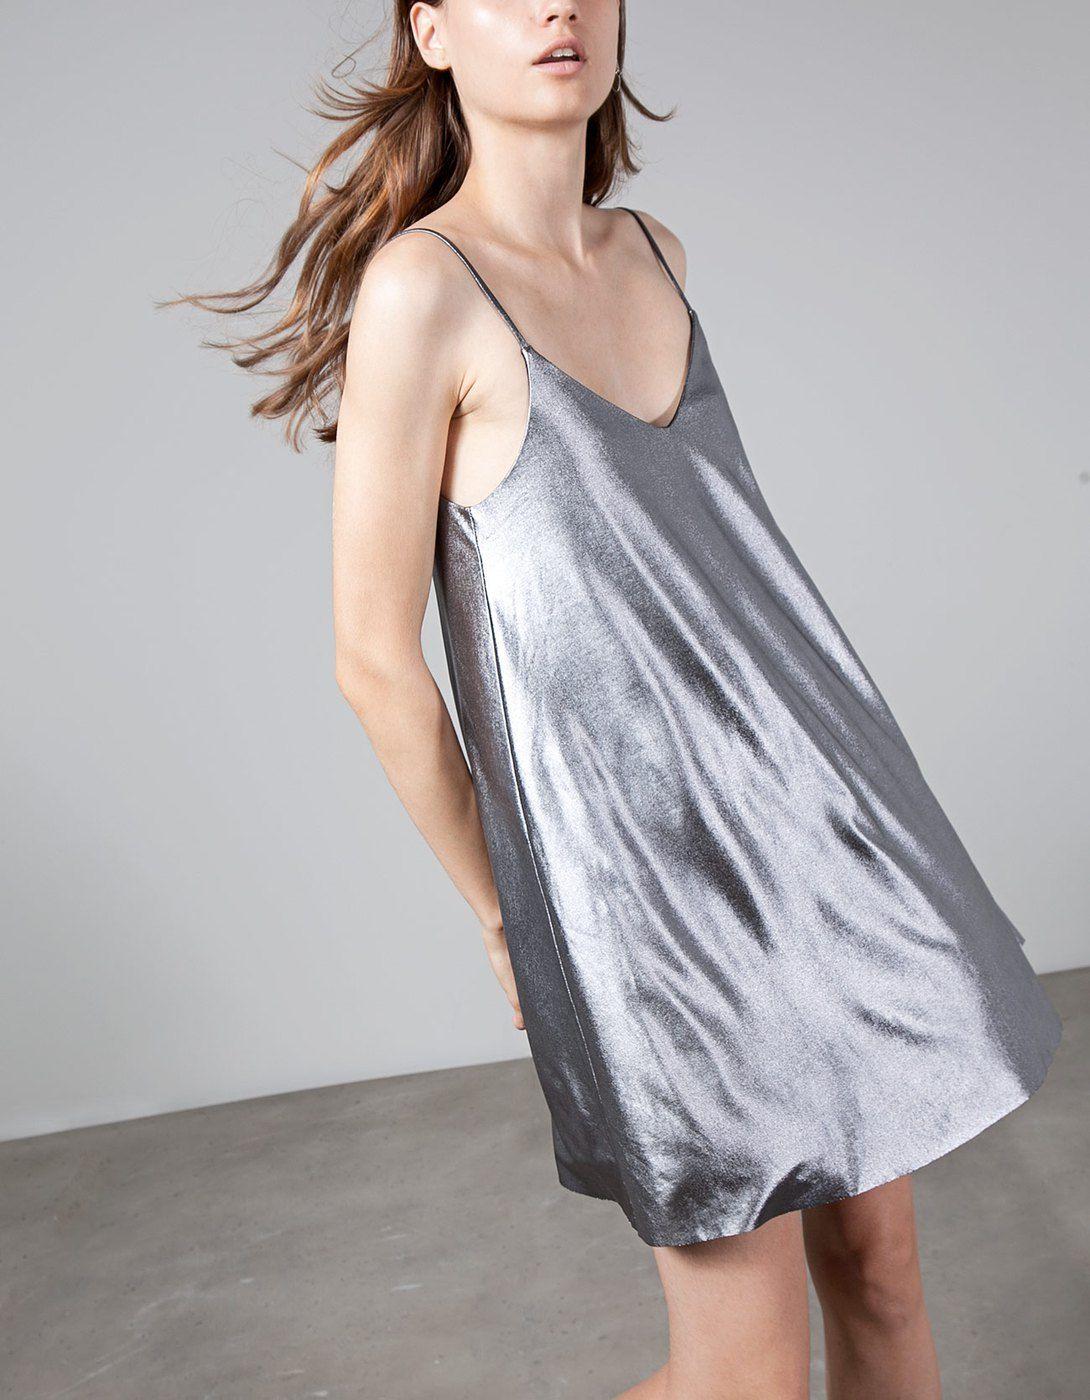 Vestido de alças foil | My style... | Pinterest | Vestiditos